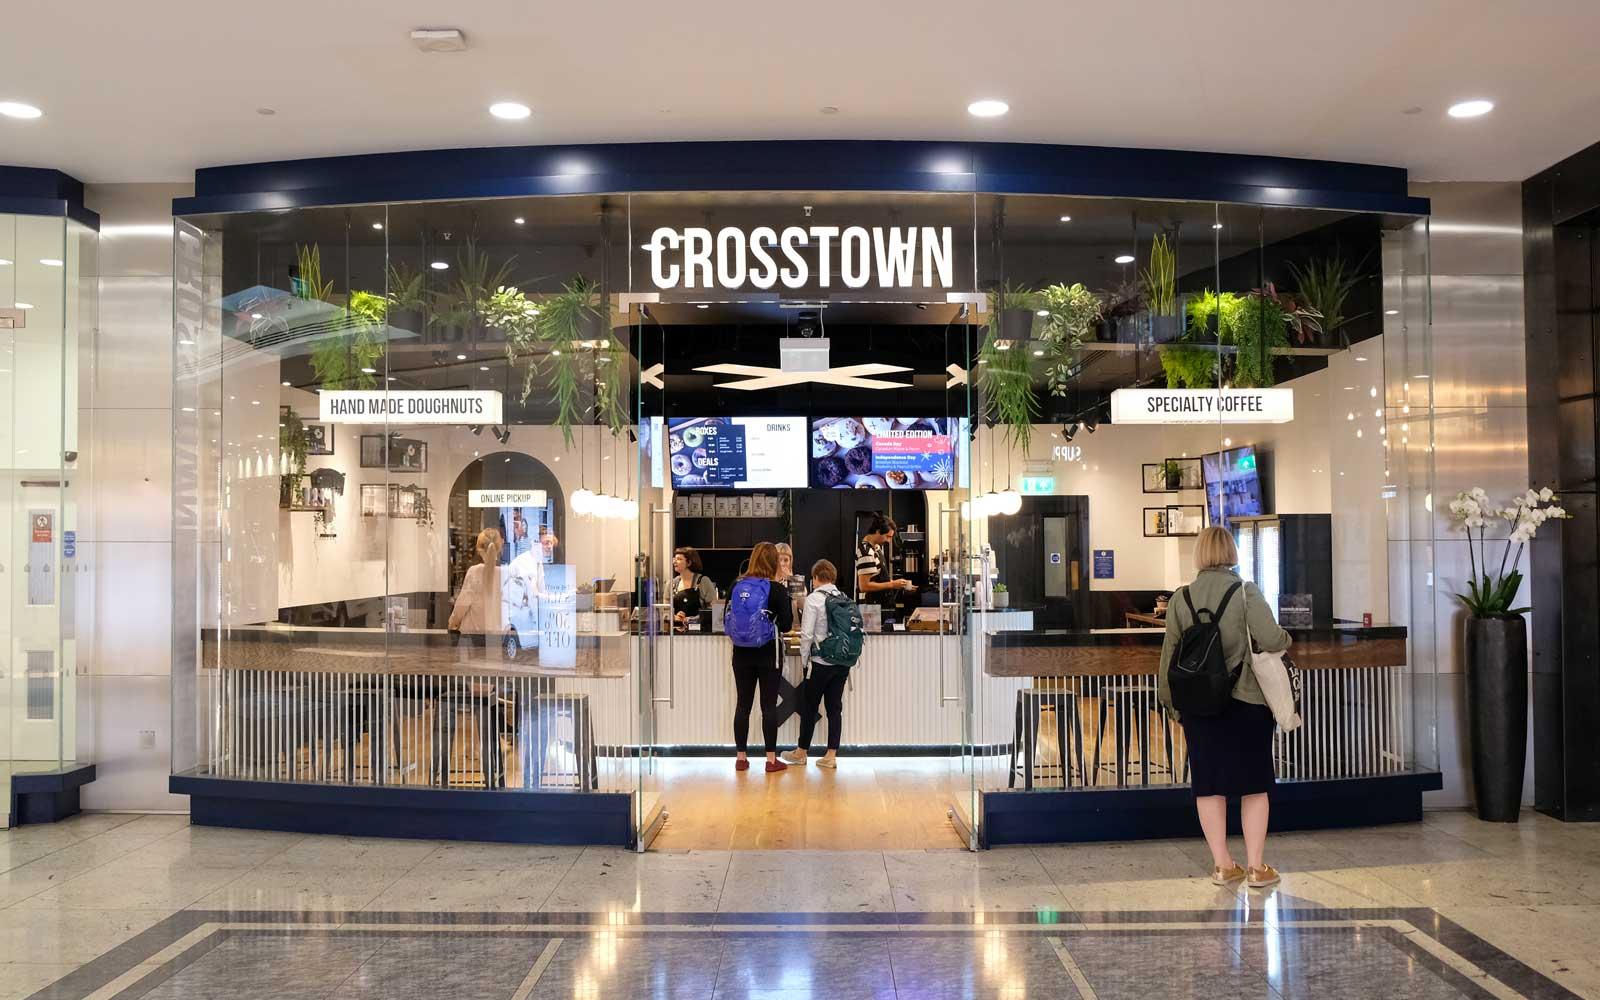 Crosstown Doughnuts & Coffee at Canary Wharf